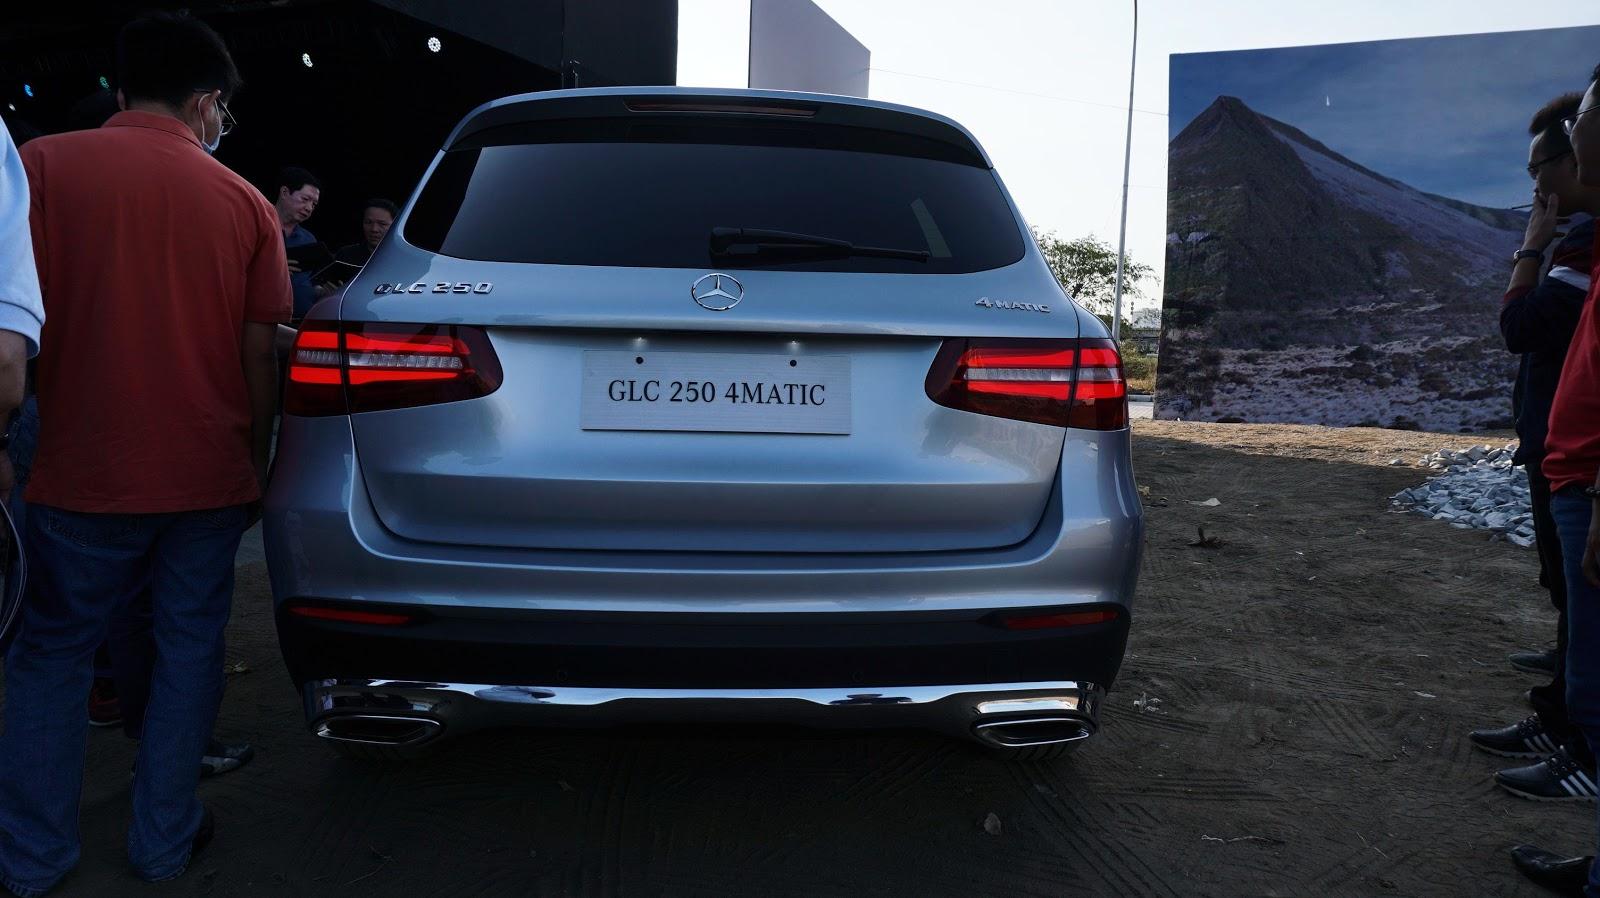 Cận cảnh Mercedes-Benz GLC 250 4Matic 2016